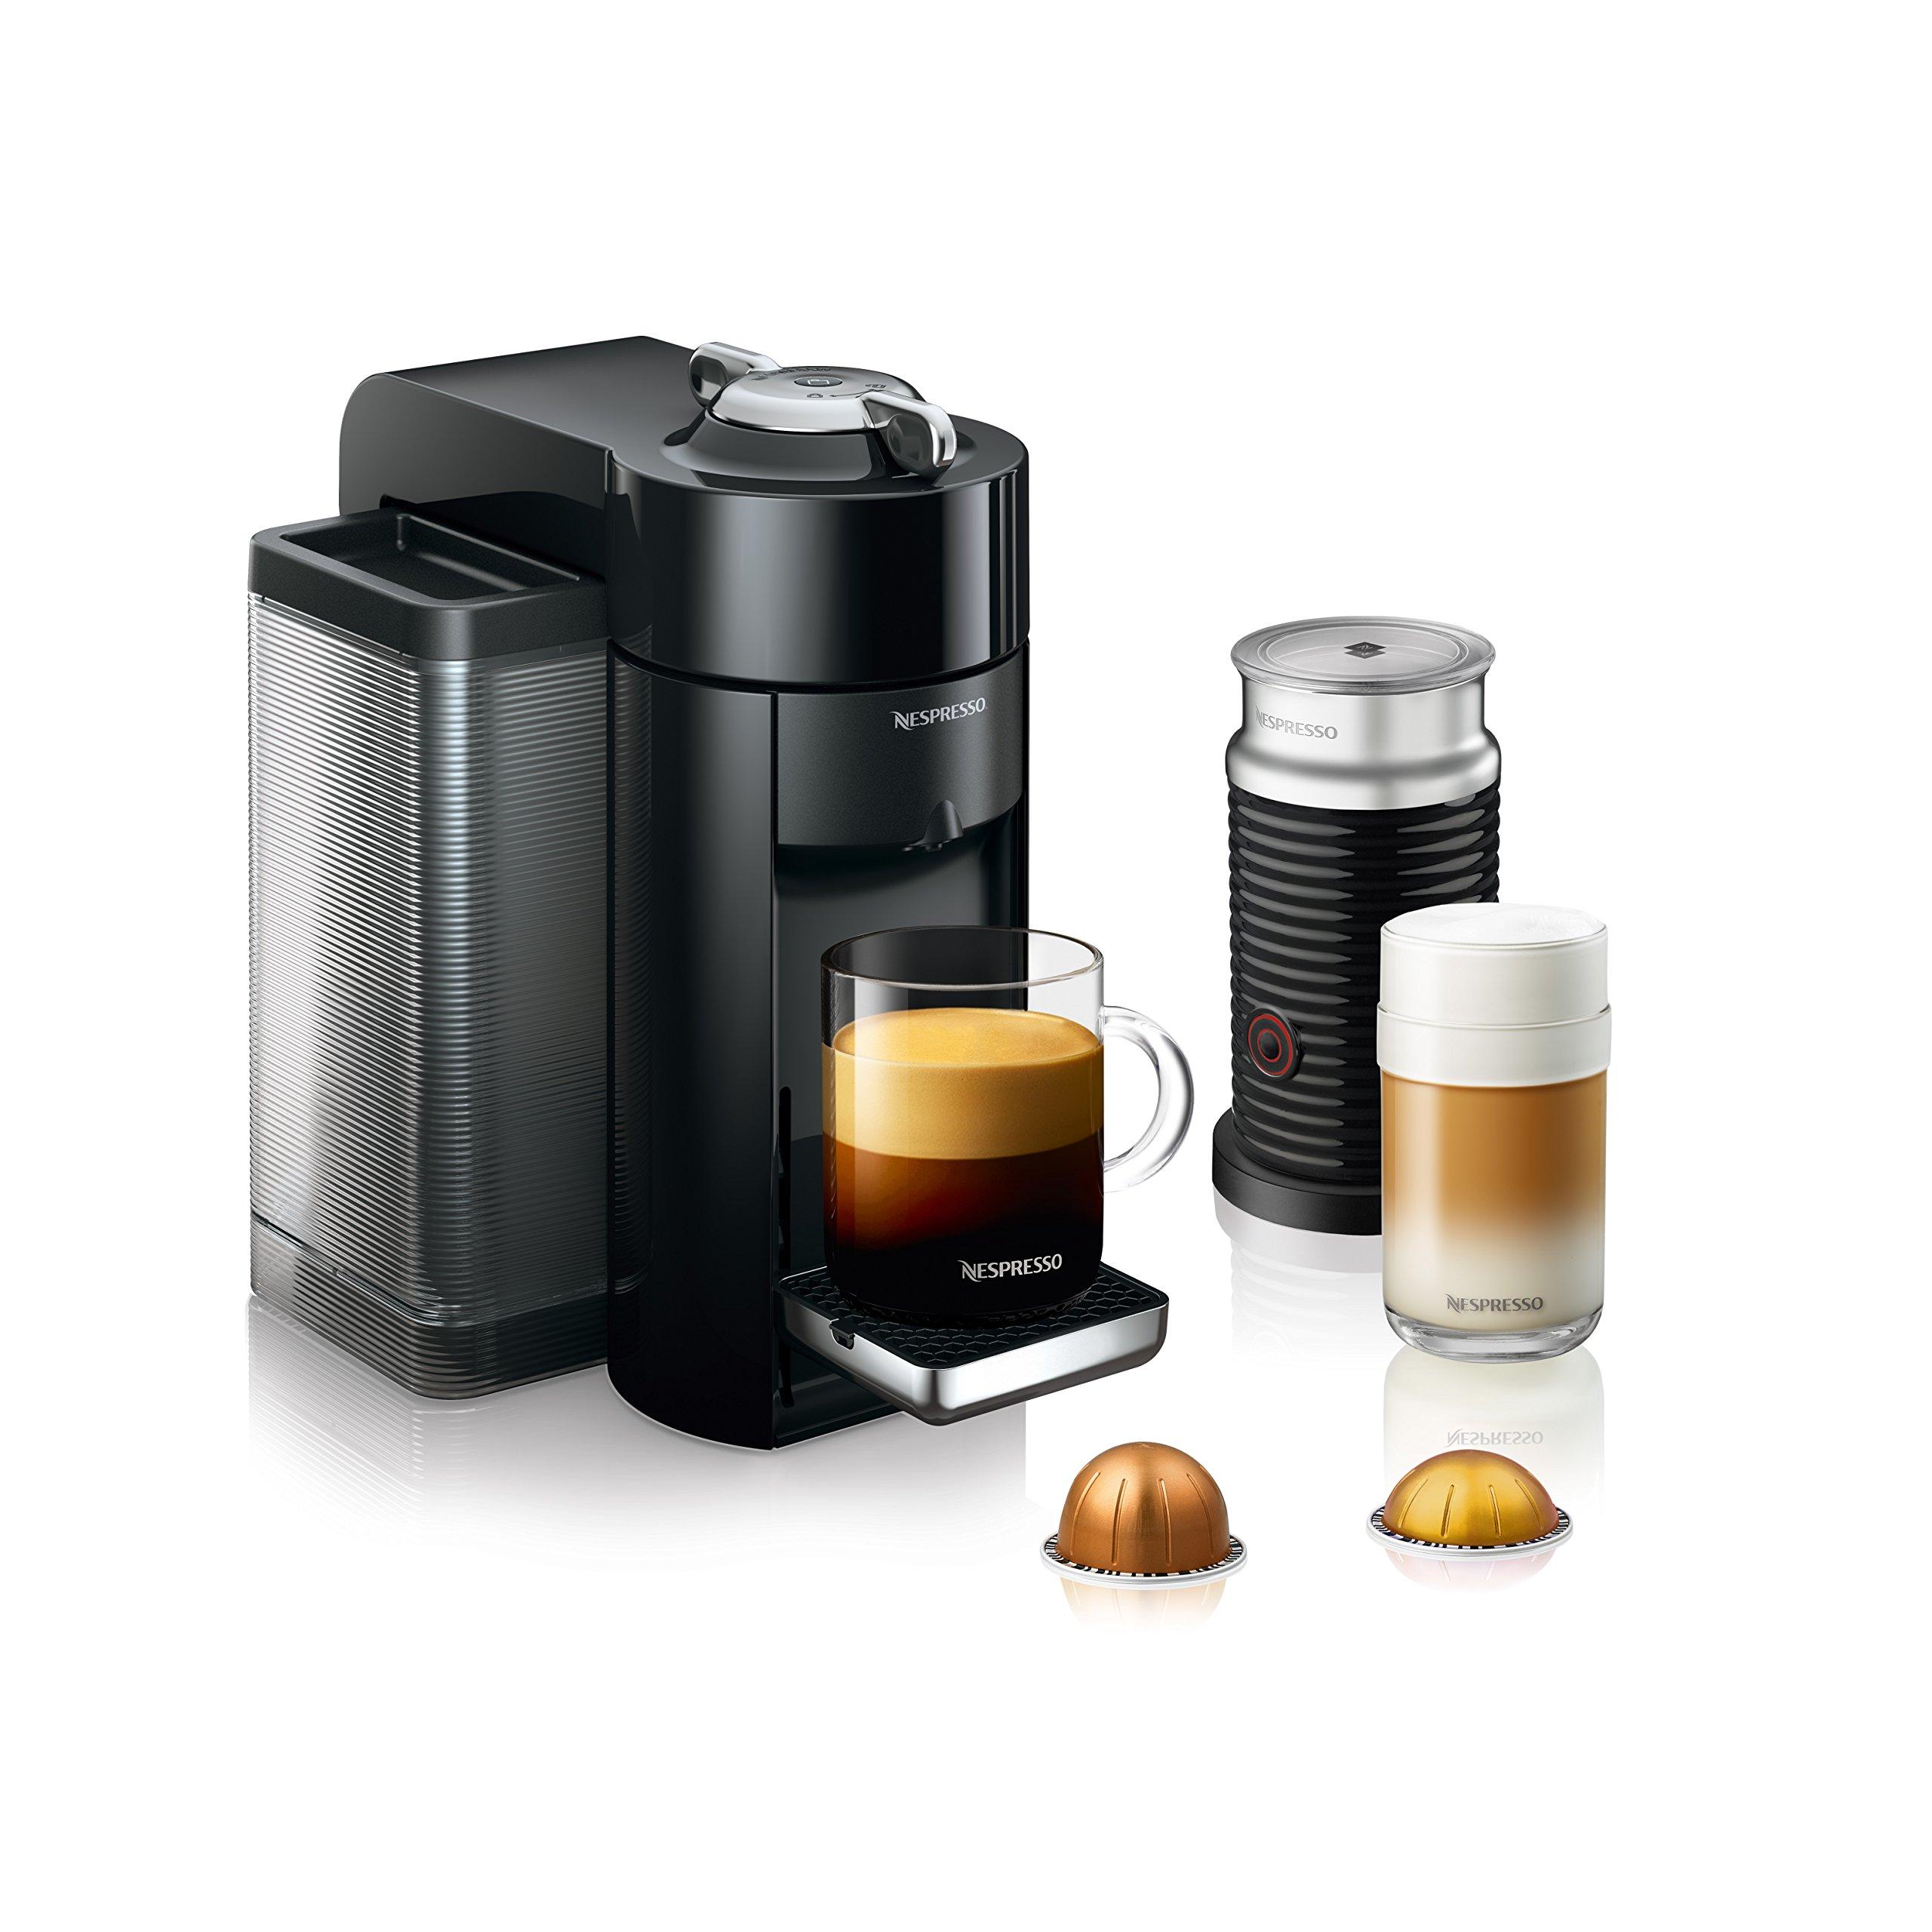 Nespresso ENV135BAE Coffee and Espresso Machine Bundle with Aeroccino Milk Frother by De'Longhi, Black by Nestle Nespresso